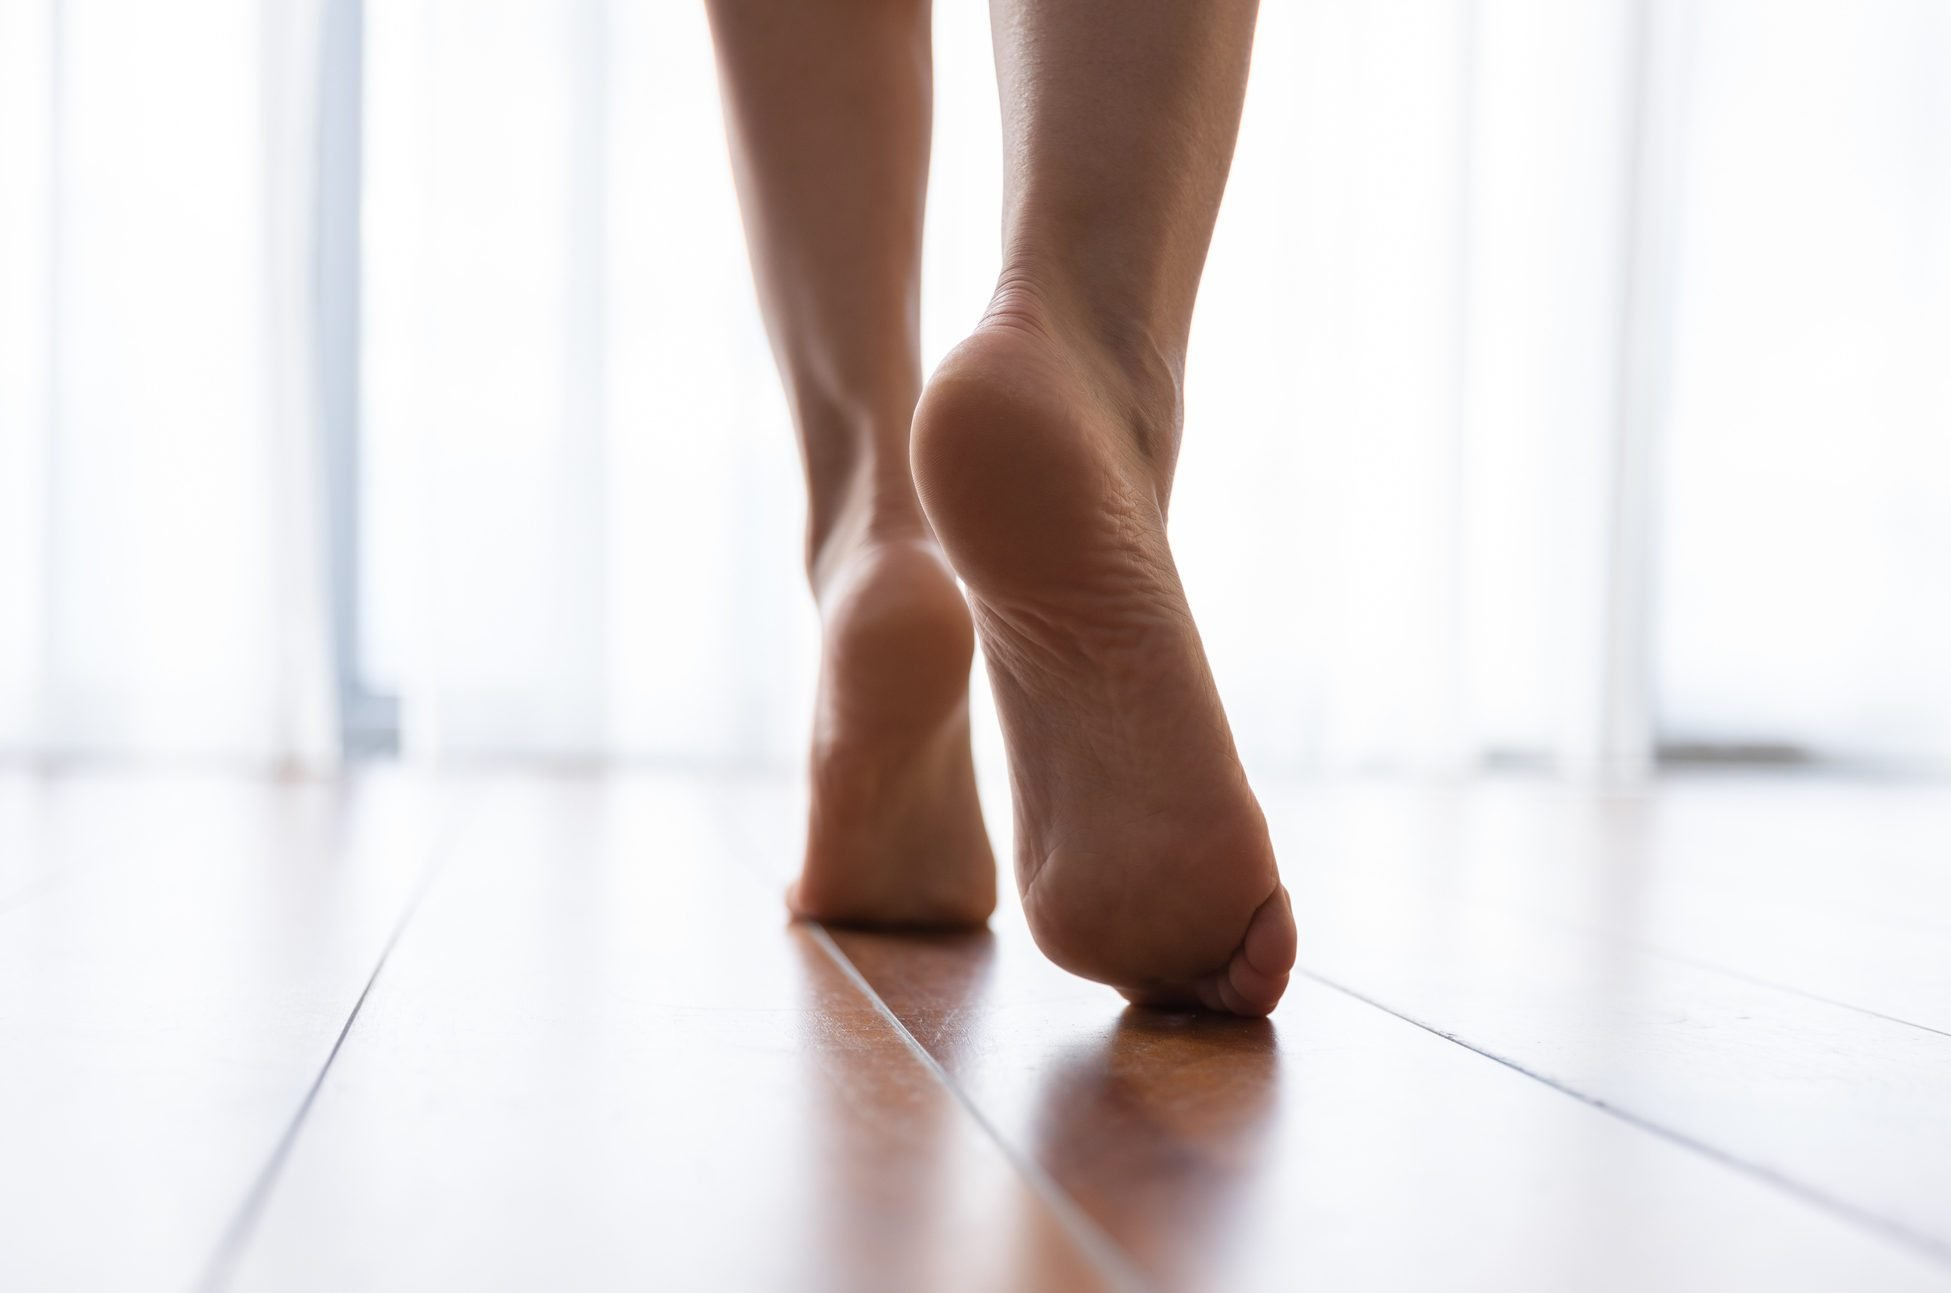 Female feet walking on warm heated floor close up view